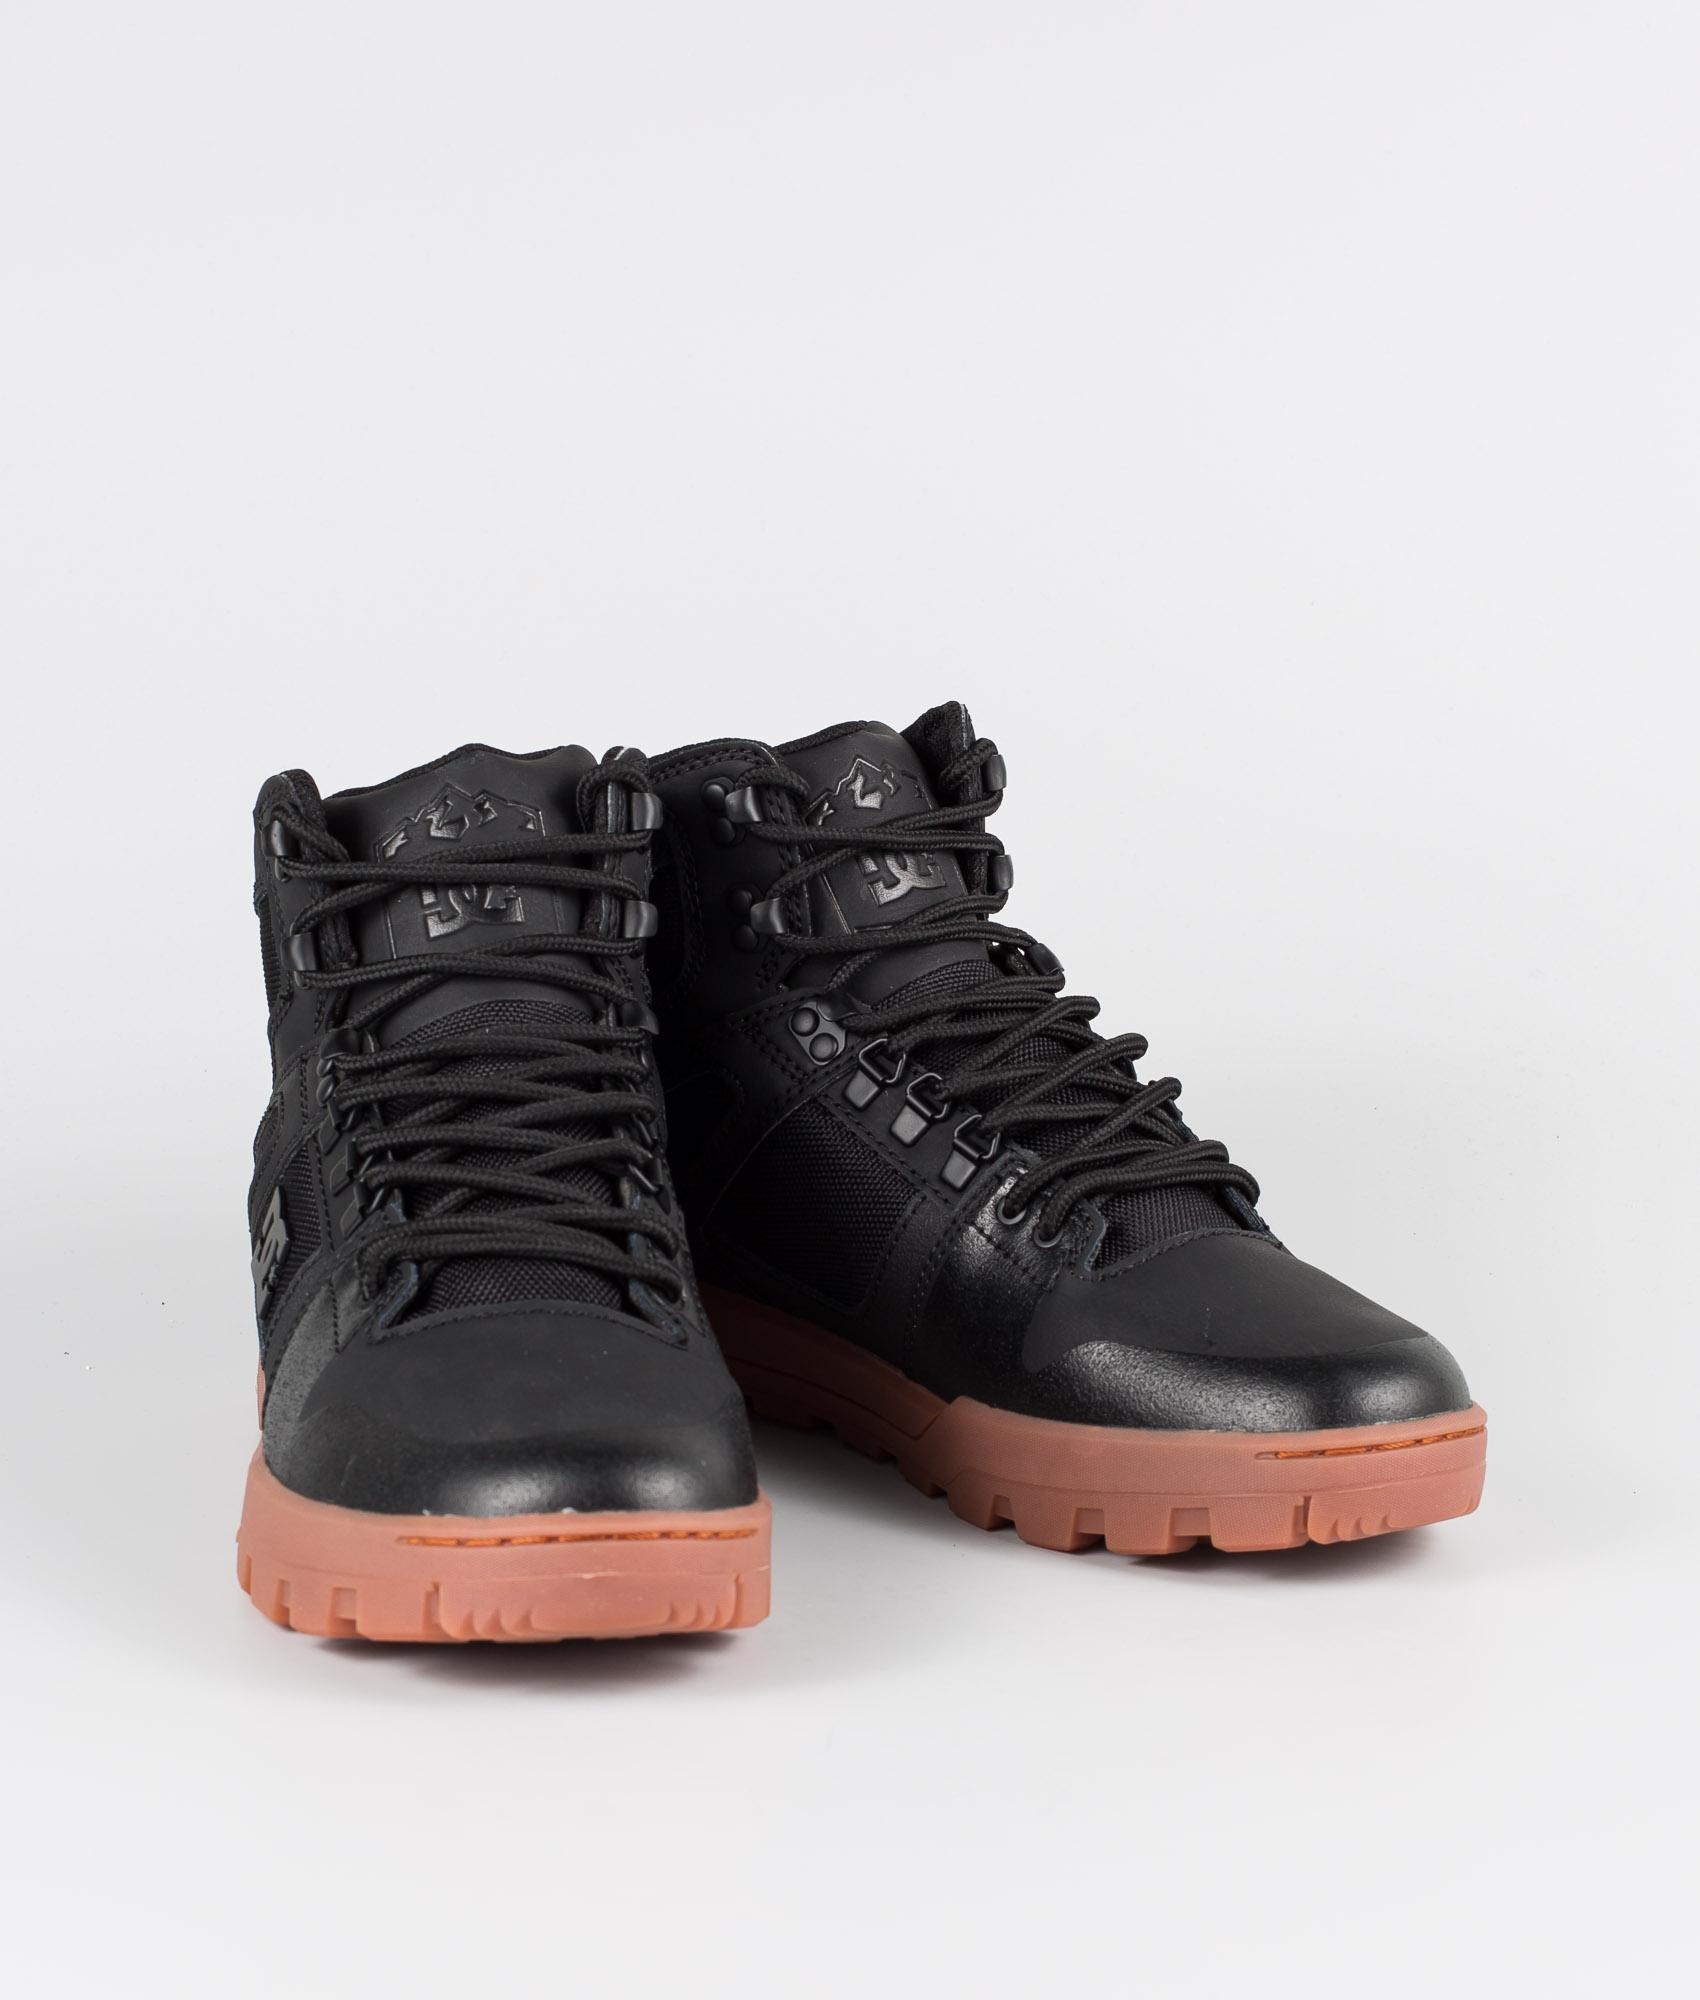 DC Schuhe Pure Wr BlackGum Boot High Top uTOPikXZ